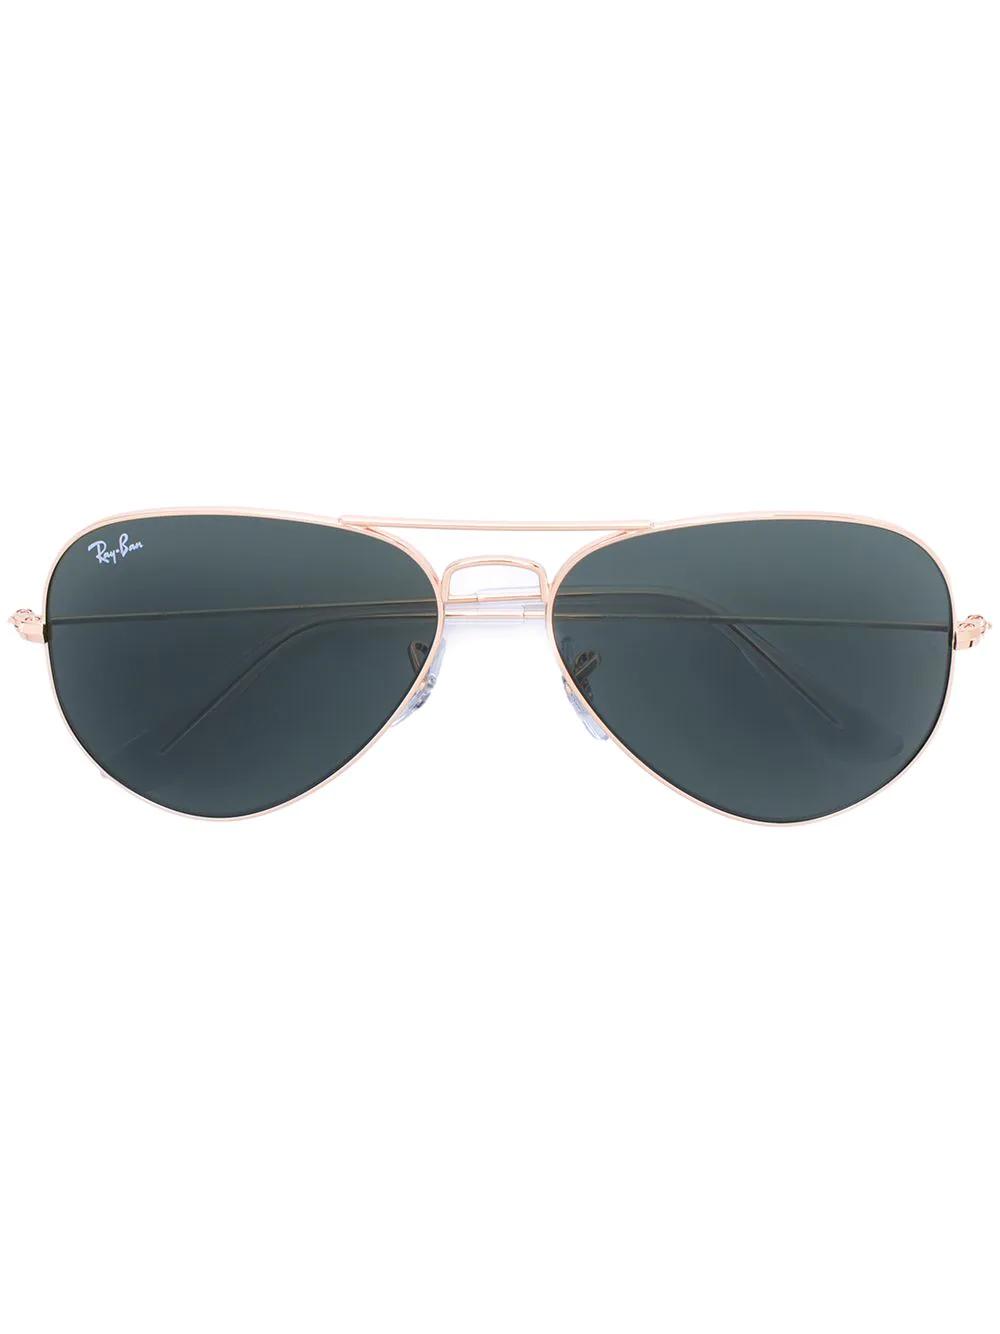 Ray Ban | солнцезащитные очки-авиаторы 'RB3025' | Clouty